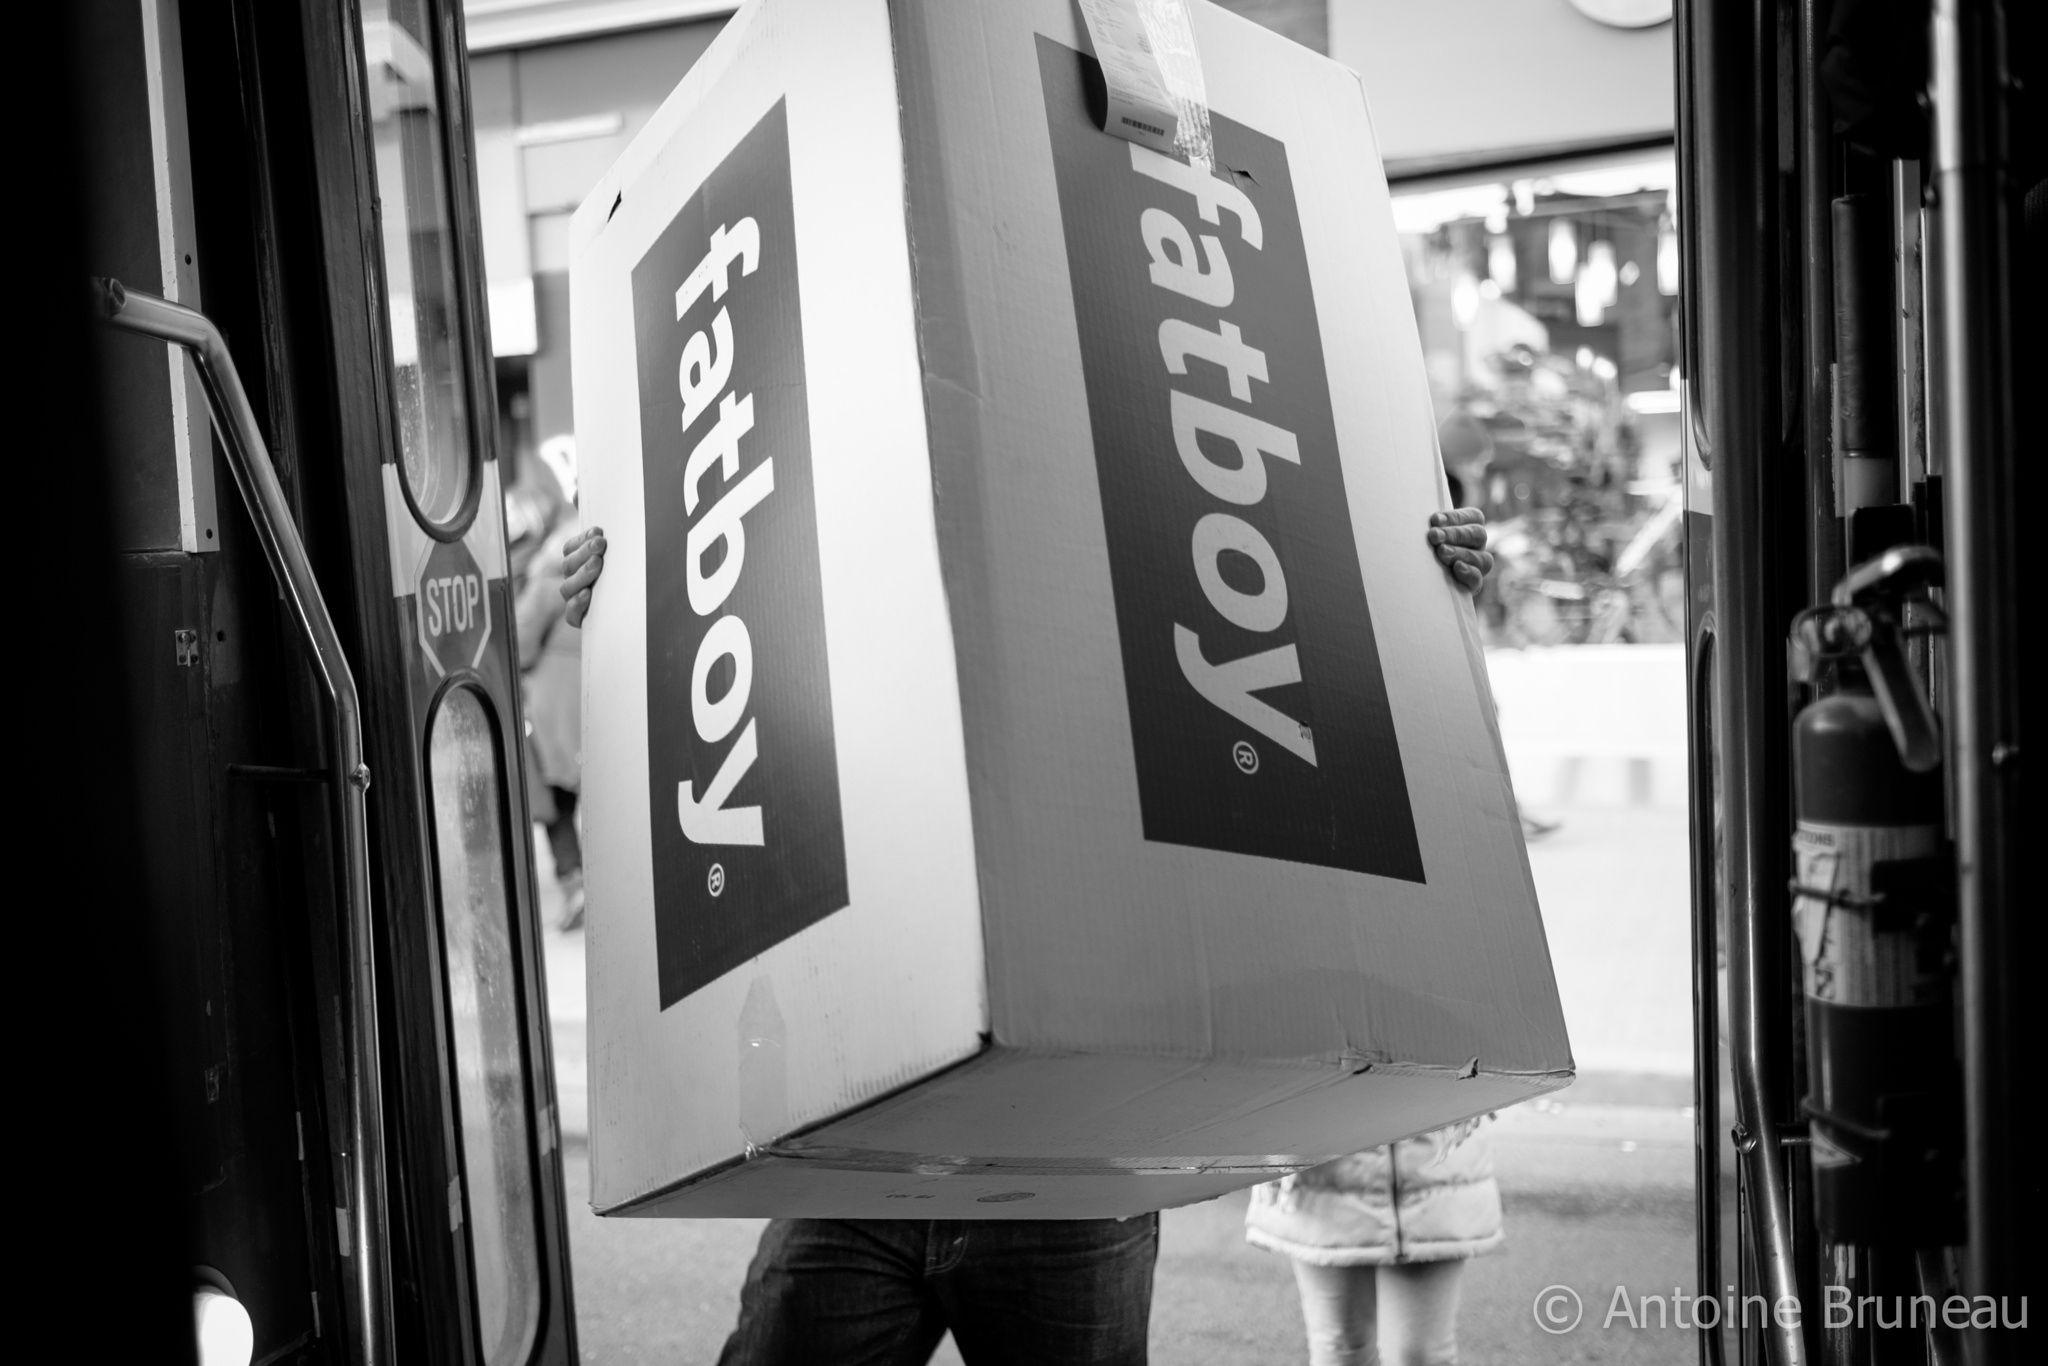 "Trans Fat - Streetcar 501 - Queen West. Toronto, Canada.  <a href=""http://www.antoinebruneau.com/"">Website</a> | <a href=""http://antoinebruneauphoto.tumblr.com/"">Tumblr</a> | <a href=""https://www.facebook.com/Antoine.Bruneau.Photography"">Facebook</a> | <a href=""https://www.flickr.com/photos/ubrane"">Flickr</a>"